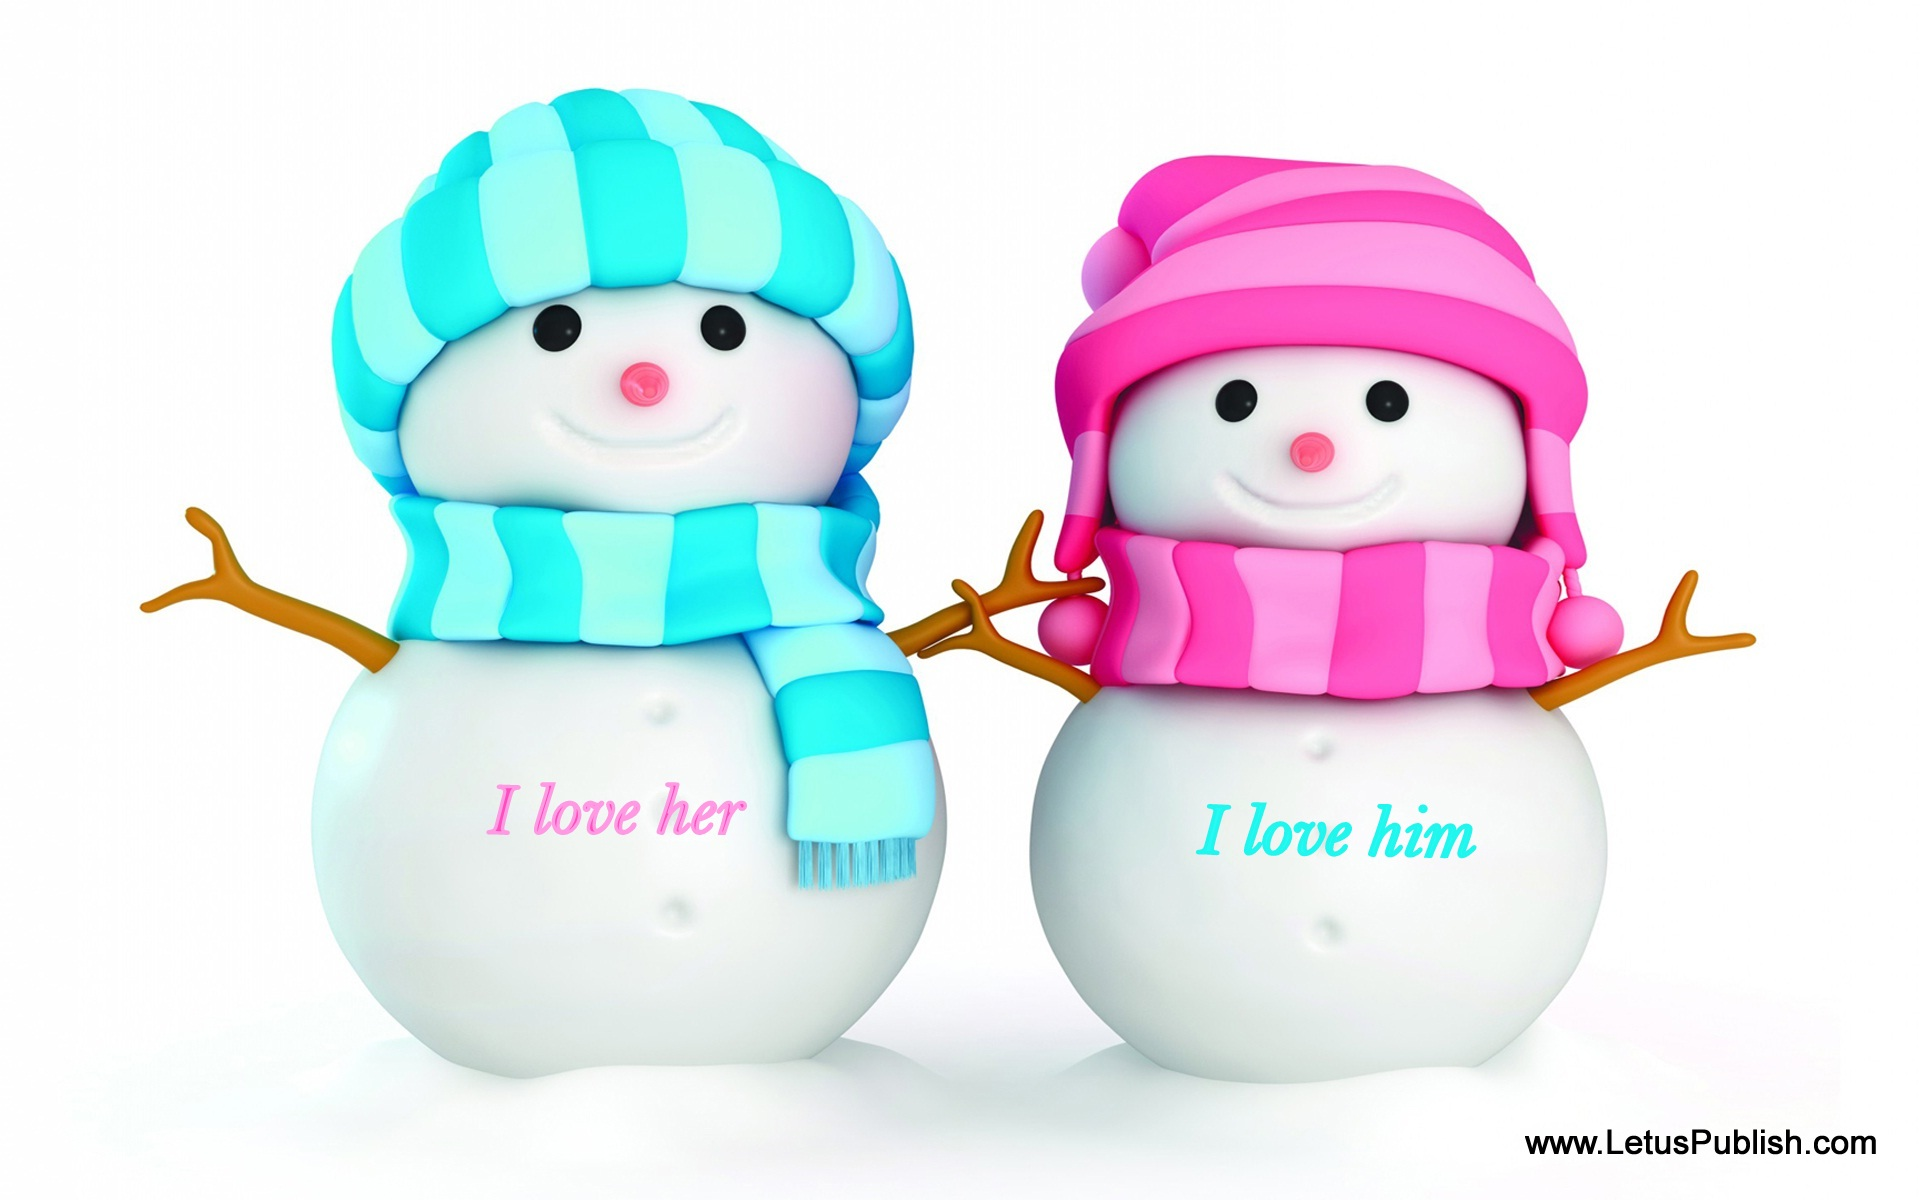 Cute romantic snowy couples love images